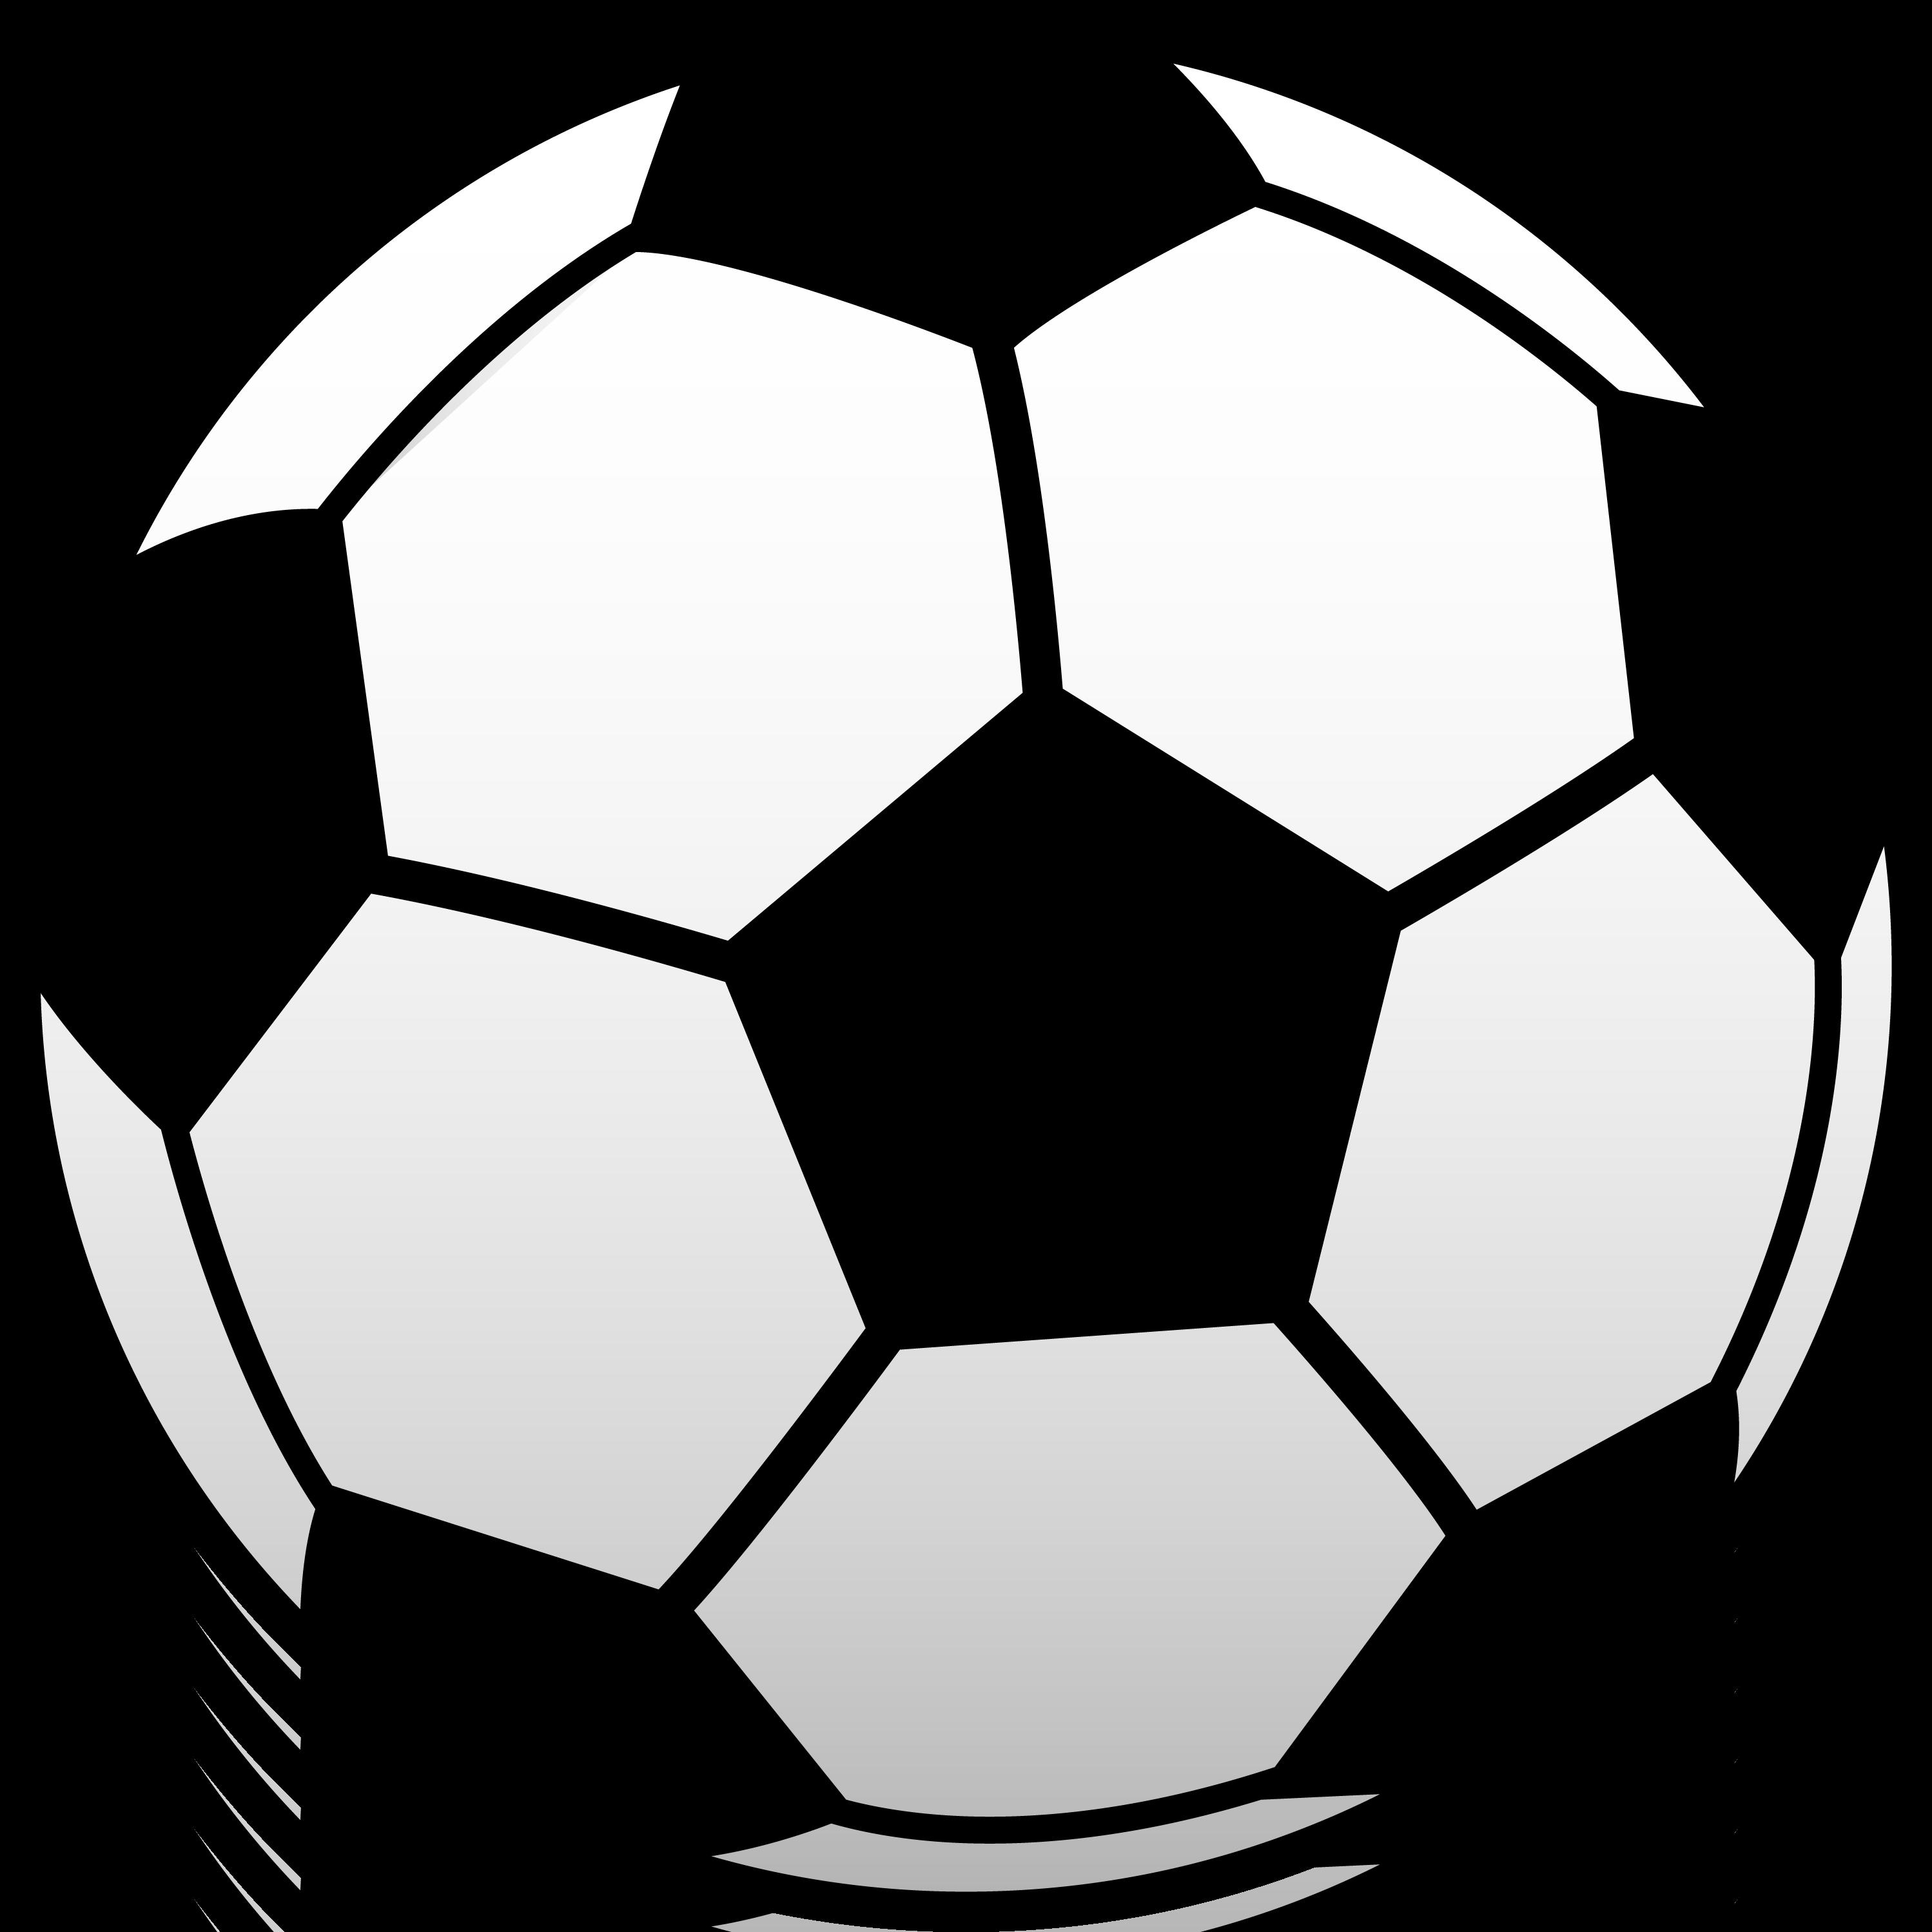 2997x2997 Soccer Ball Or Foot Ball